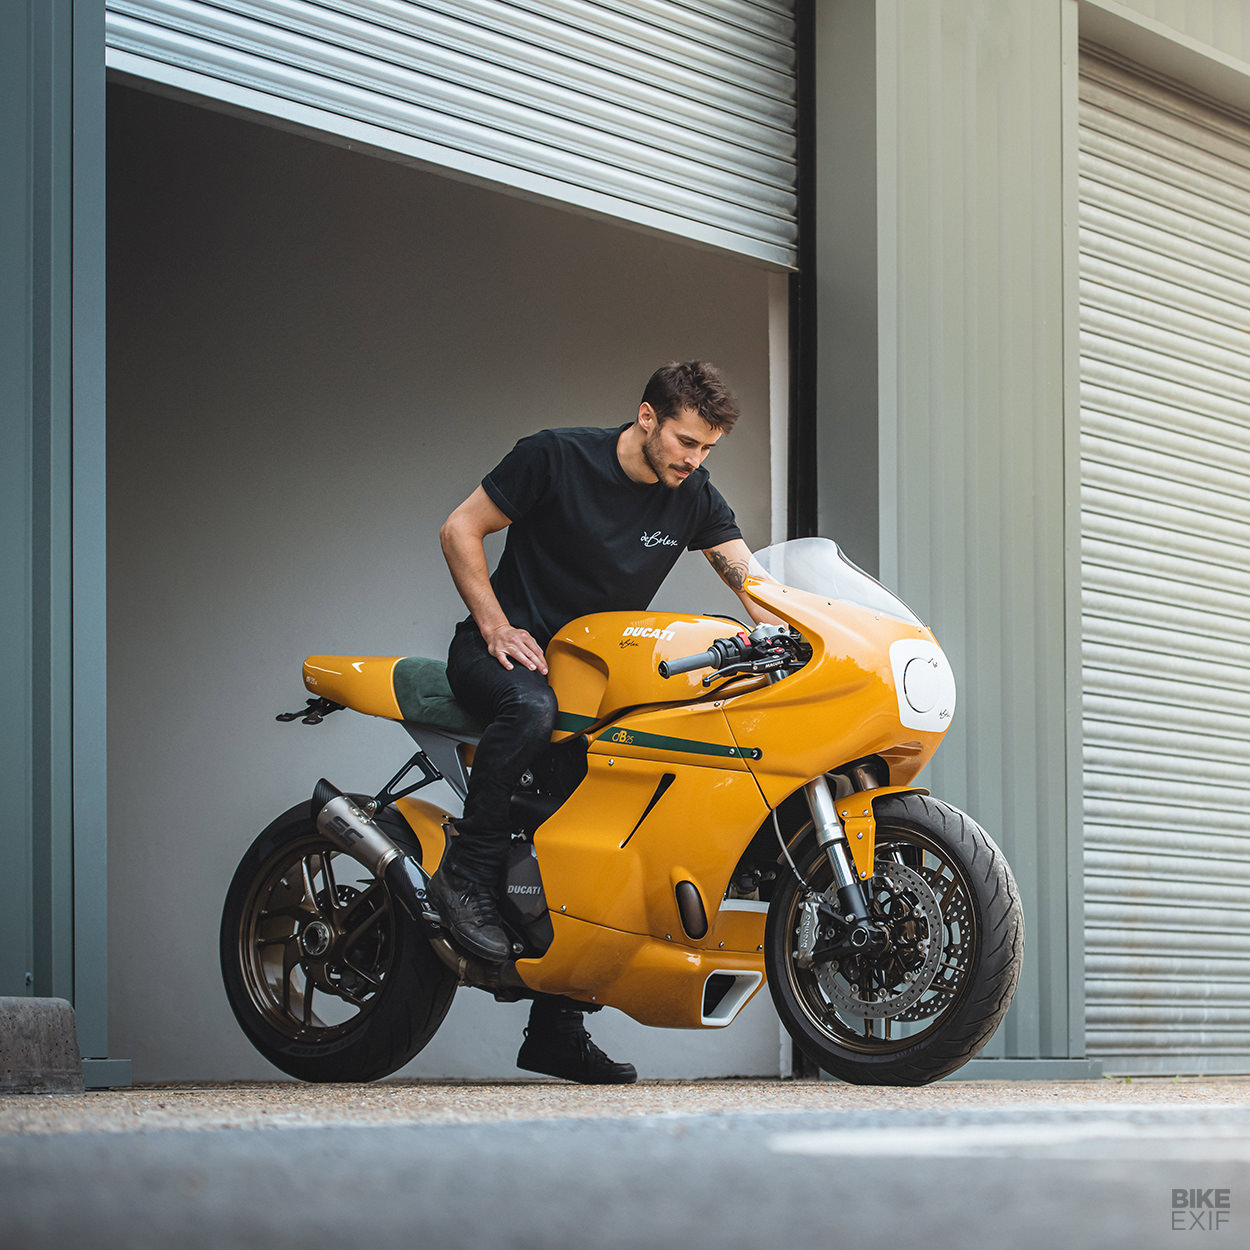 db25: A series of Ducati Monster 1200 customs from deBolex